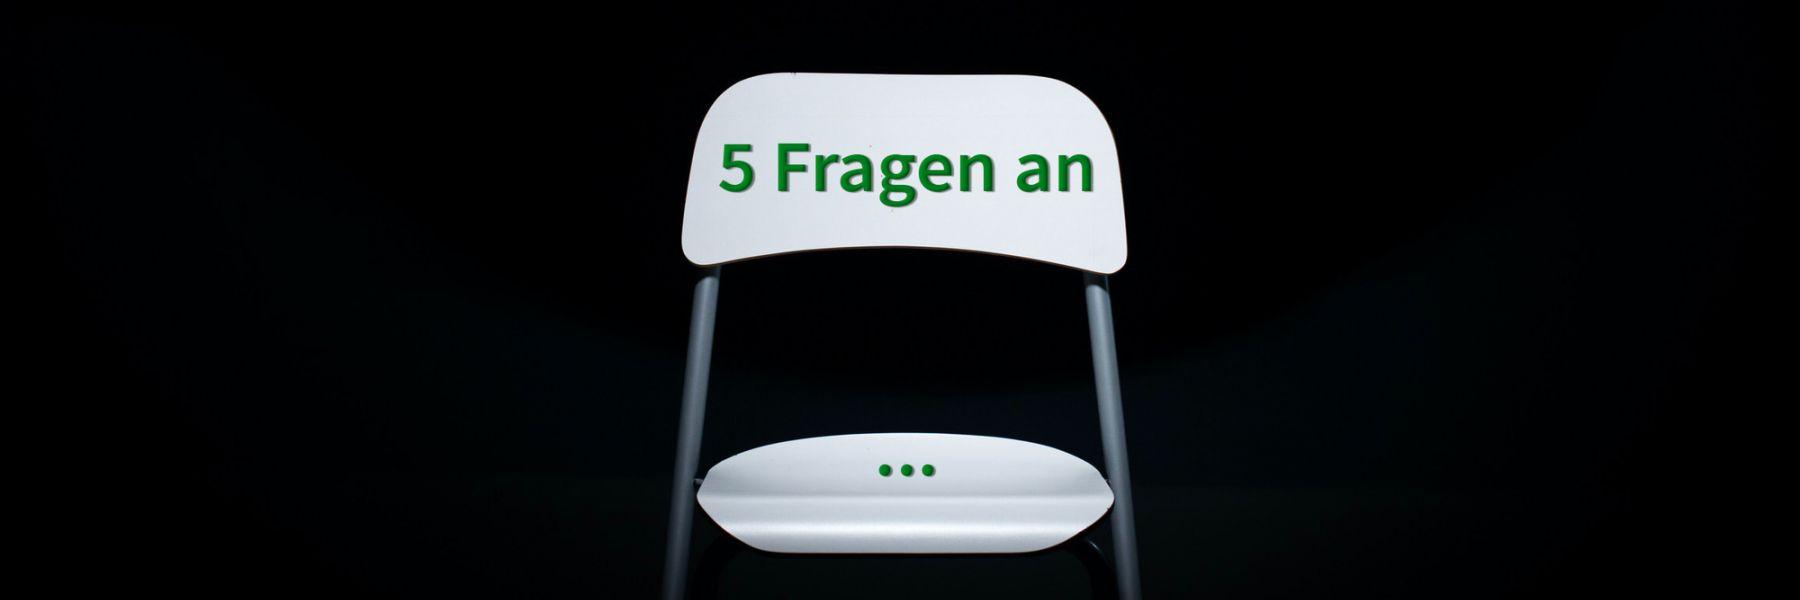 5 Fragen an : Konrad Auinger, PIA Automation Holding GmbH